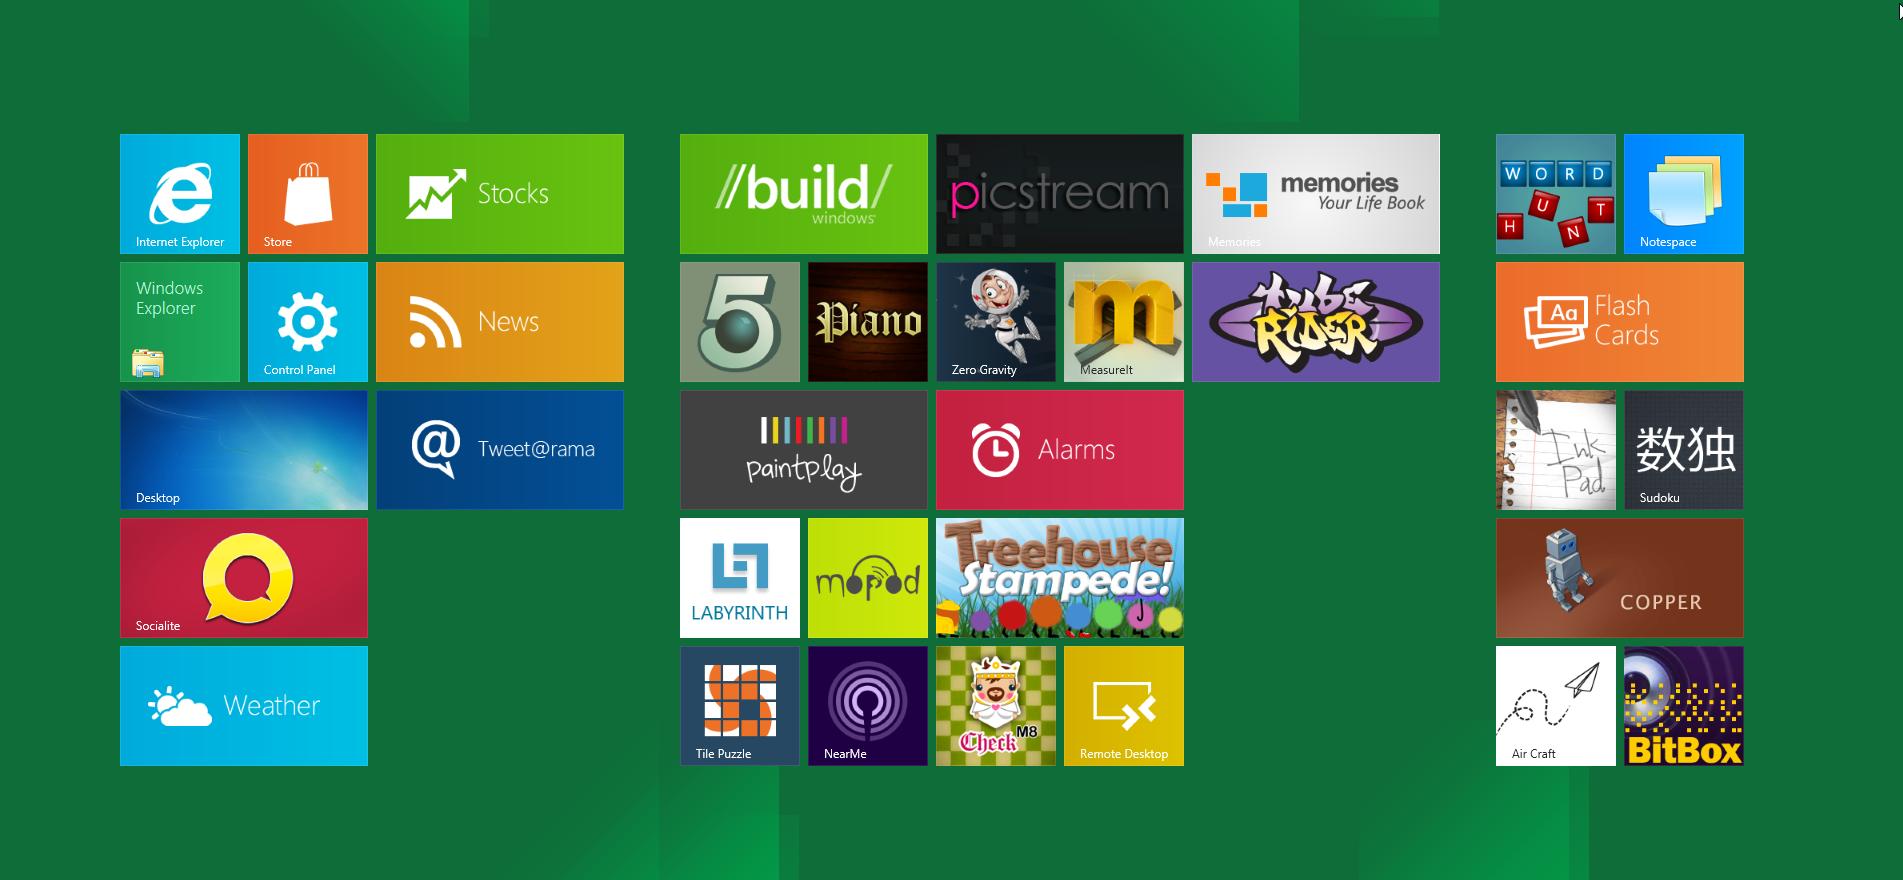 Windows8-EdgeUI-470.png?nocache=1316166865960